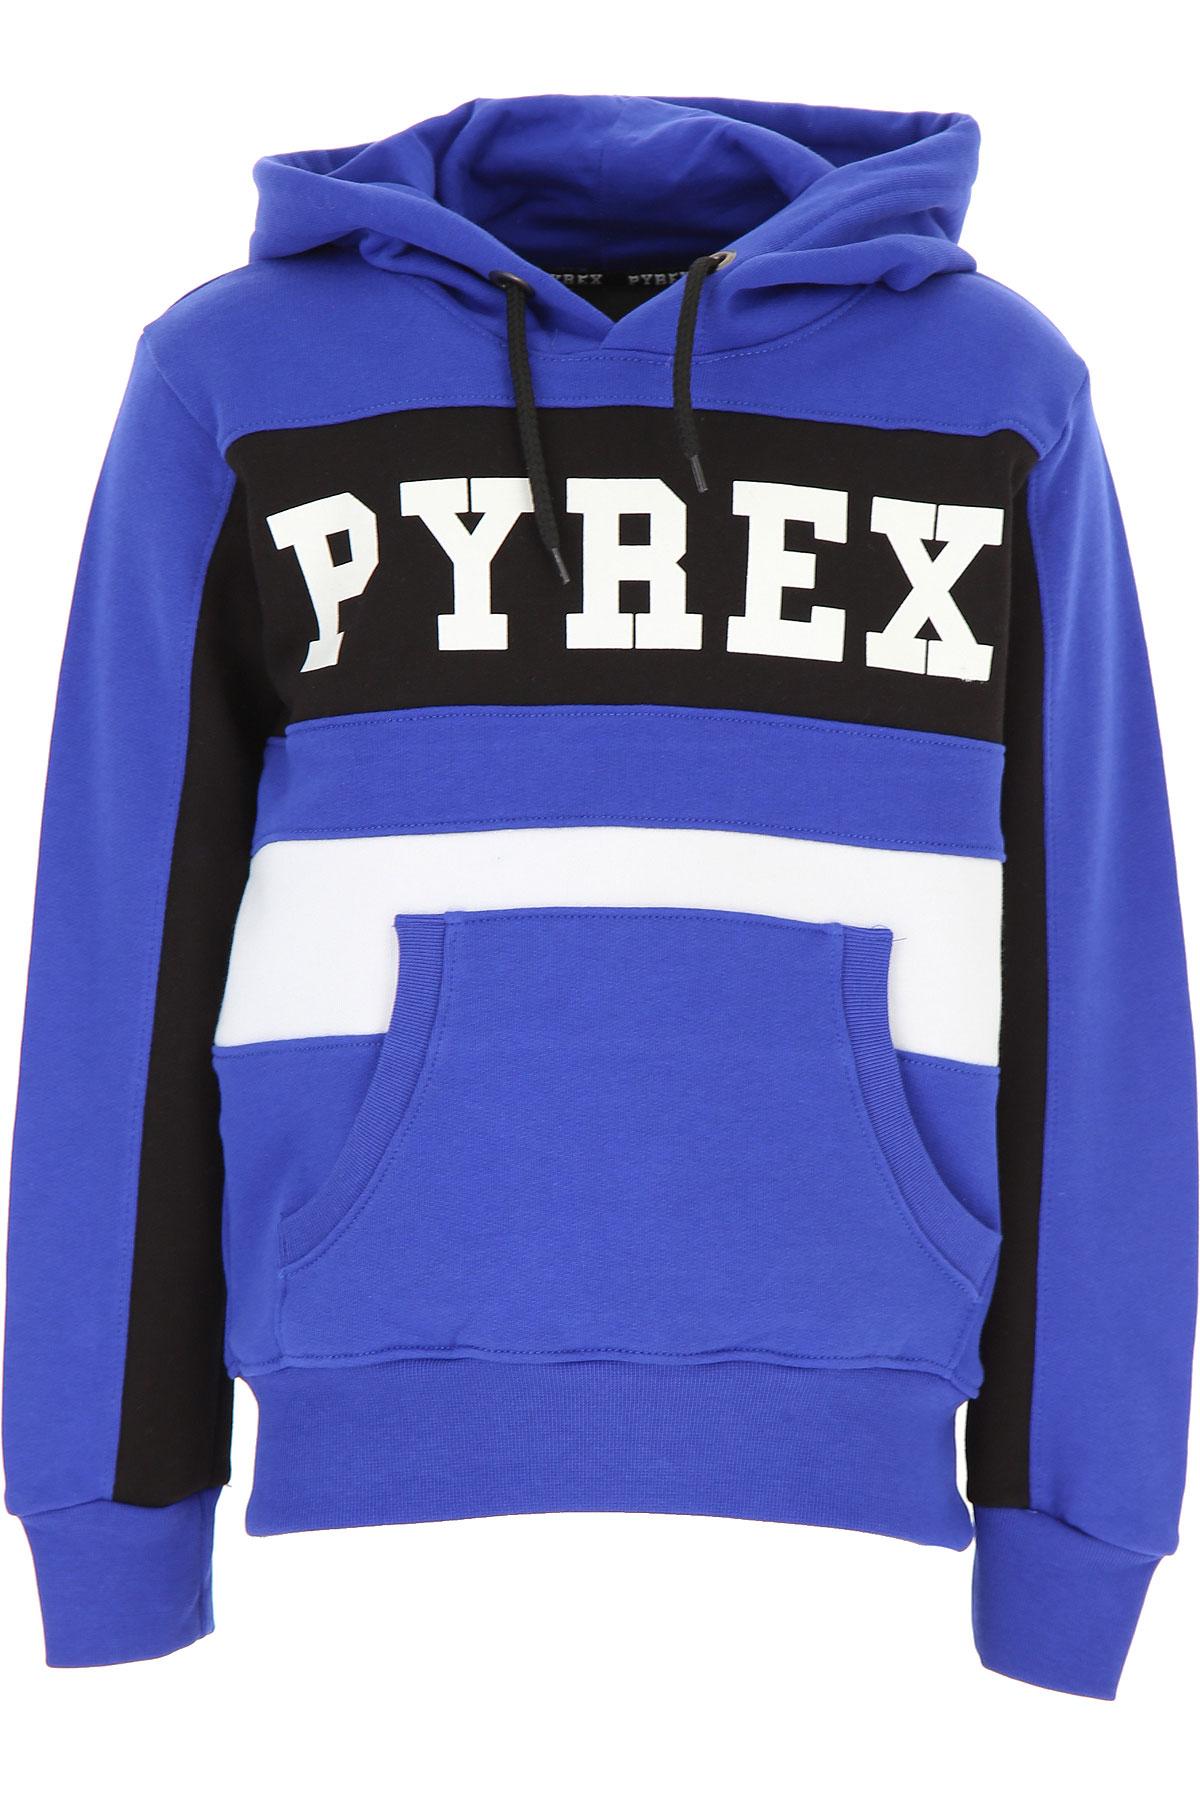 Pyrex Kids Sweatshirts & Hoodies for Boys On Sale, Blue Royal, Cotton, 2019, M S XL XS